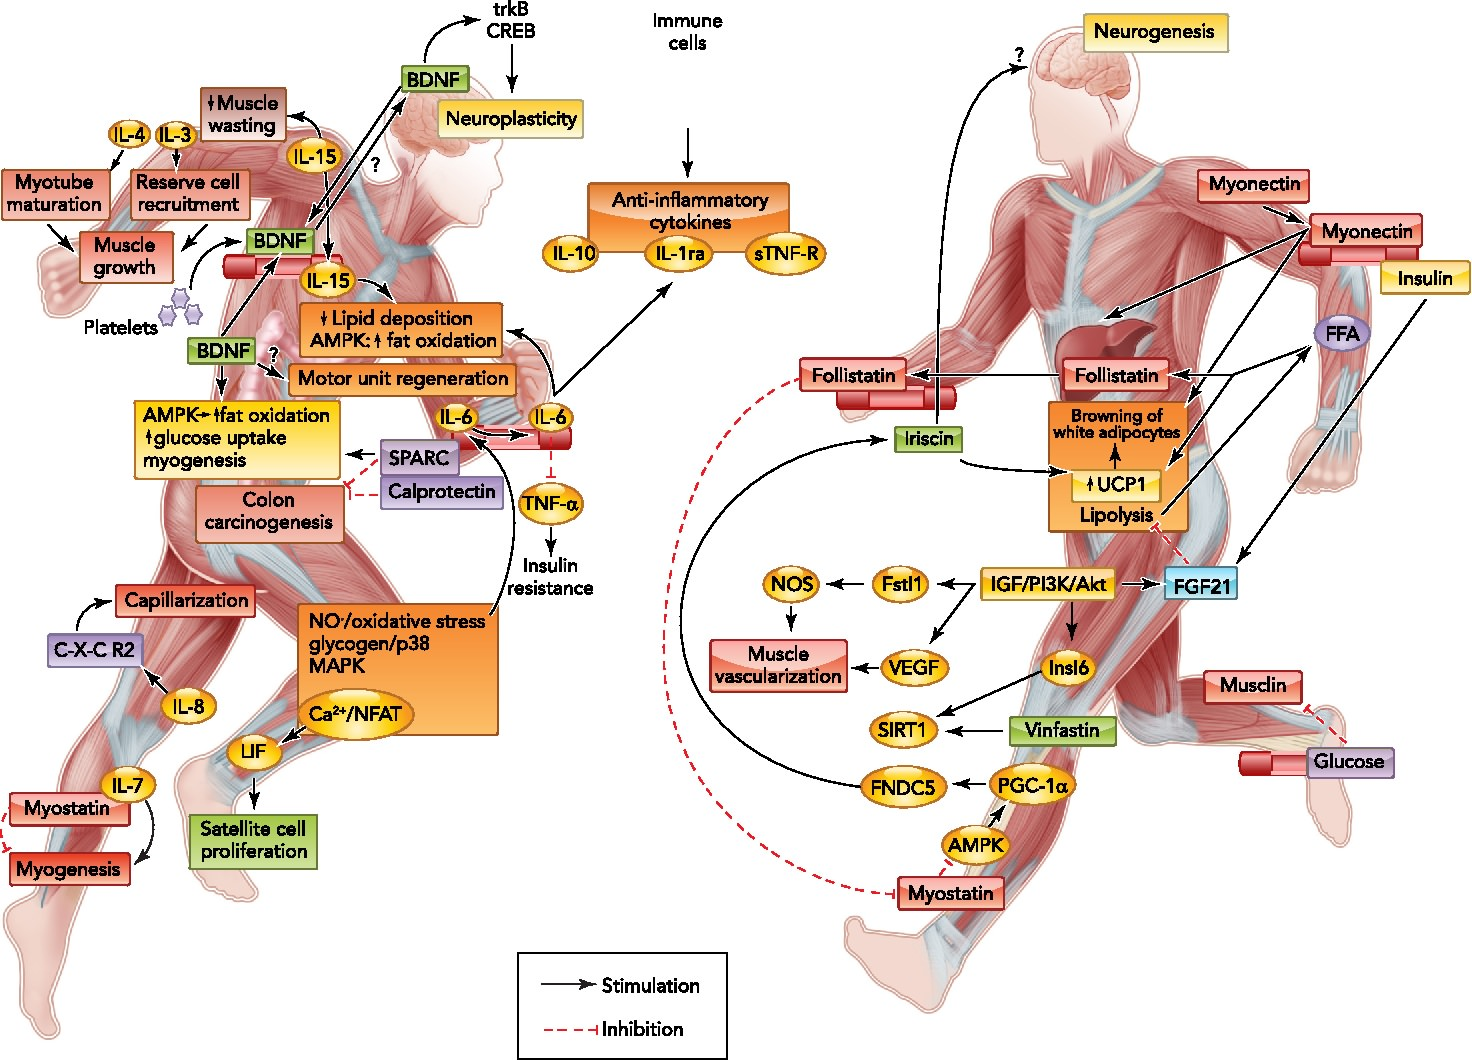 http://www.physiology.org/doi/10.1152/physiol.00019.2013